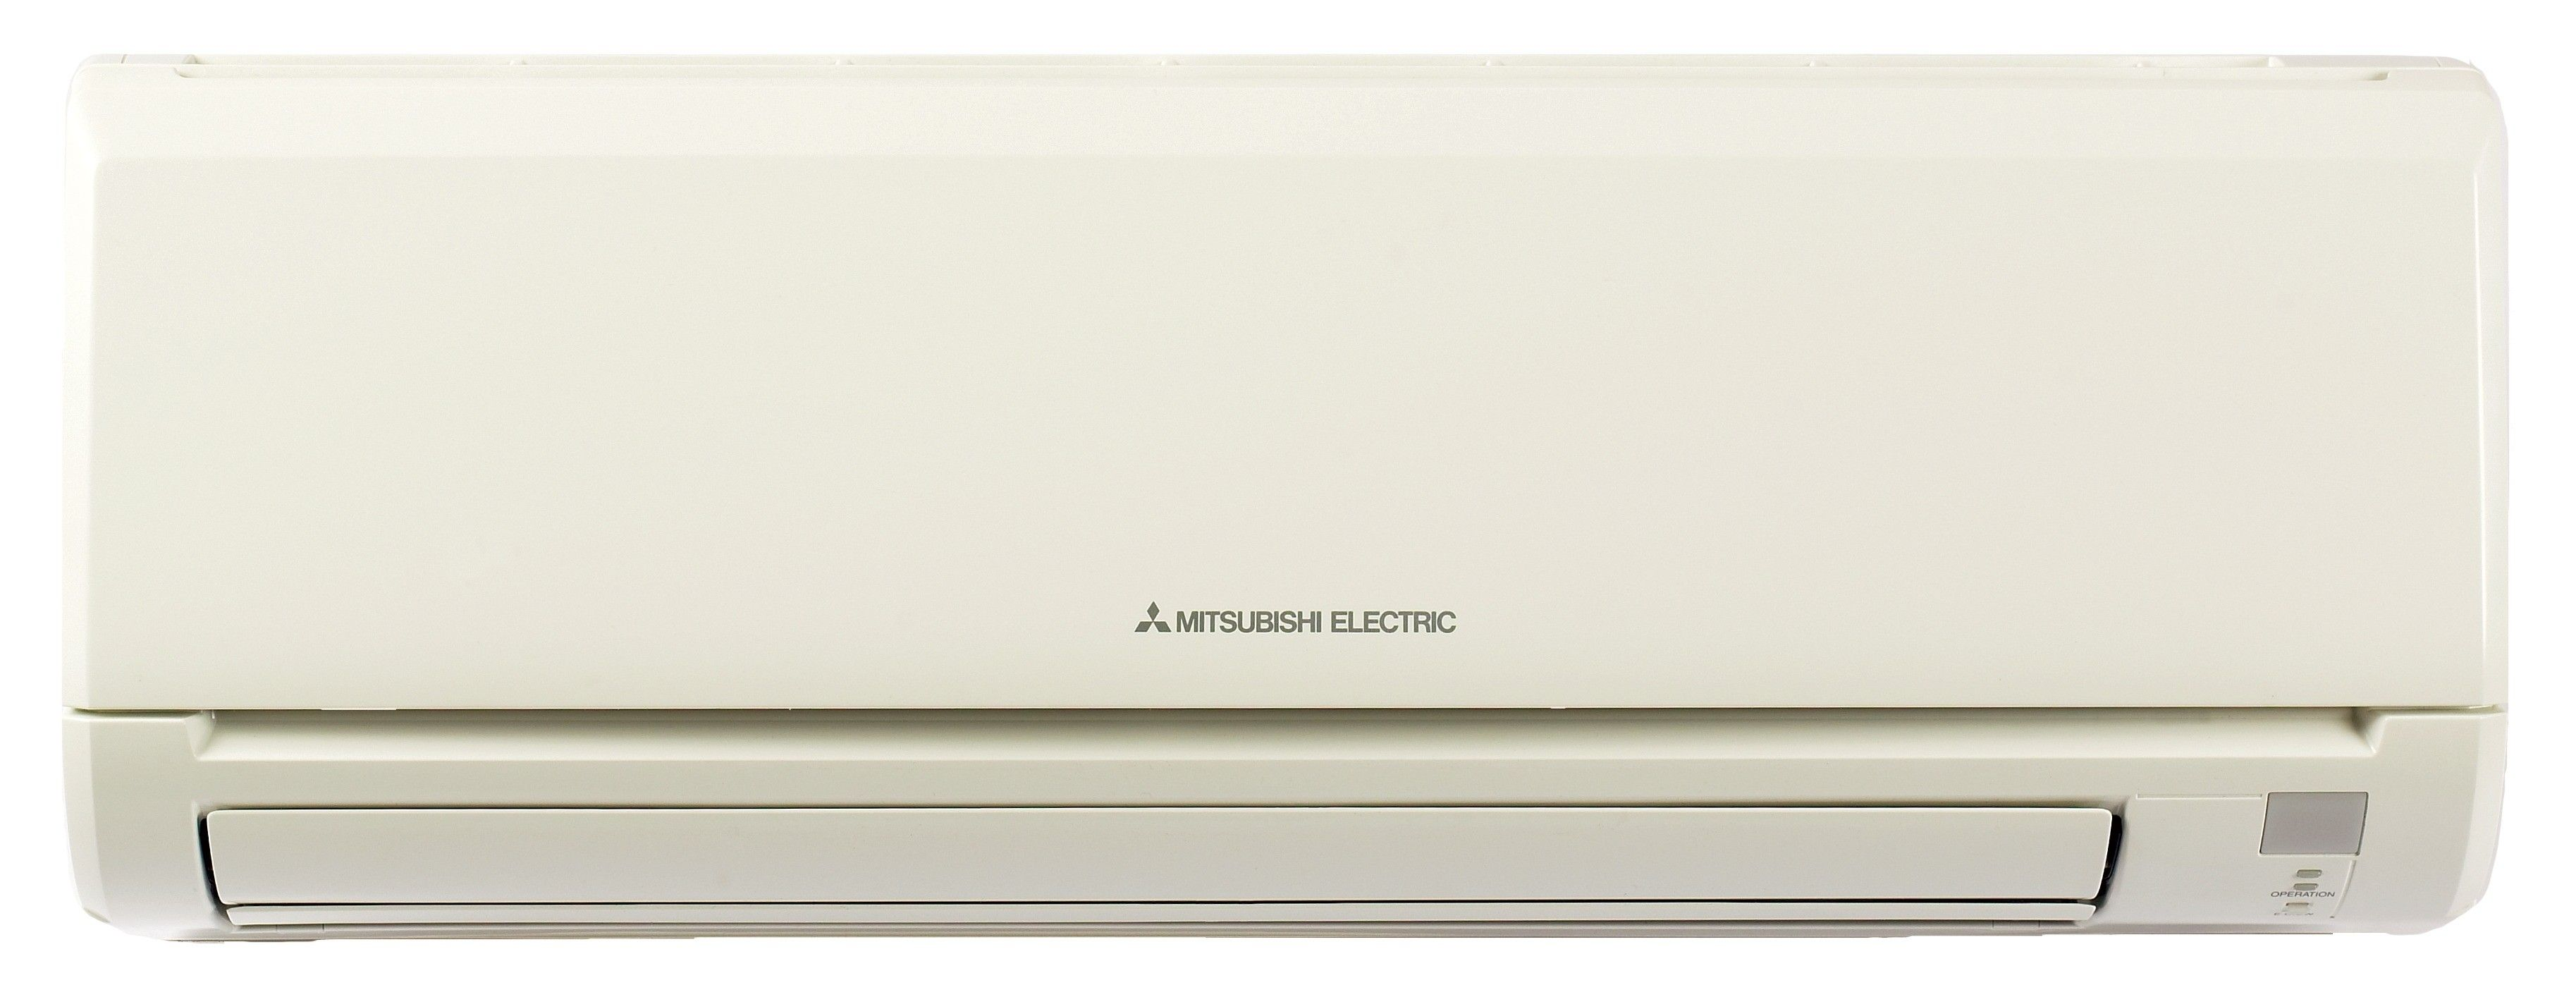 12K BTU Mitsubishi MSYGL Wall-Mounted Air Conditioner Indoor Unit